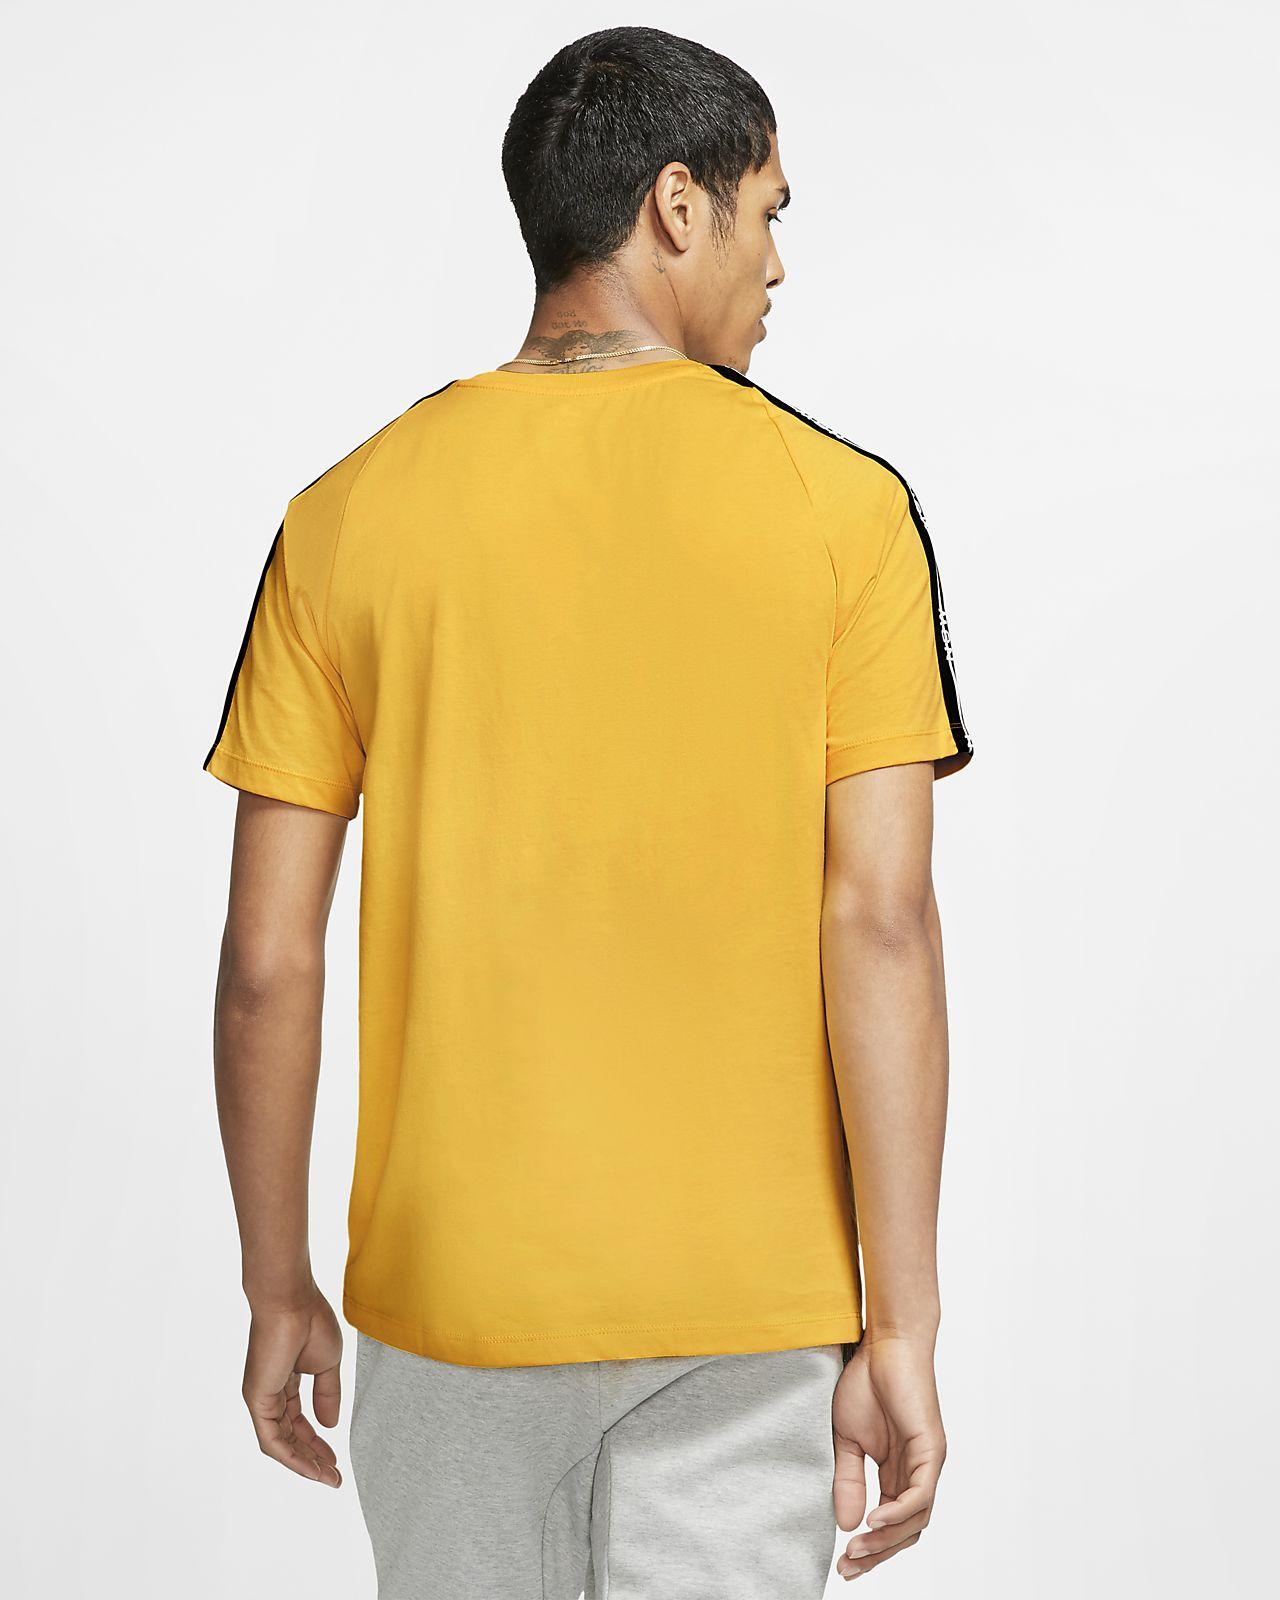 info for cd8f8 b8860 Men s T-Shirt. Nike Sportswear NSW